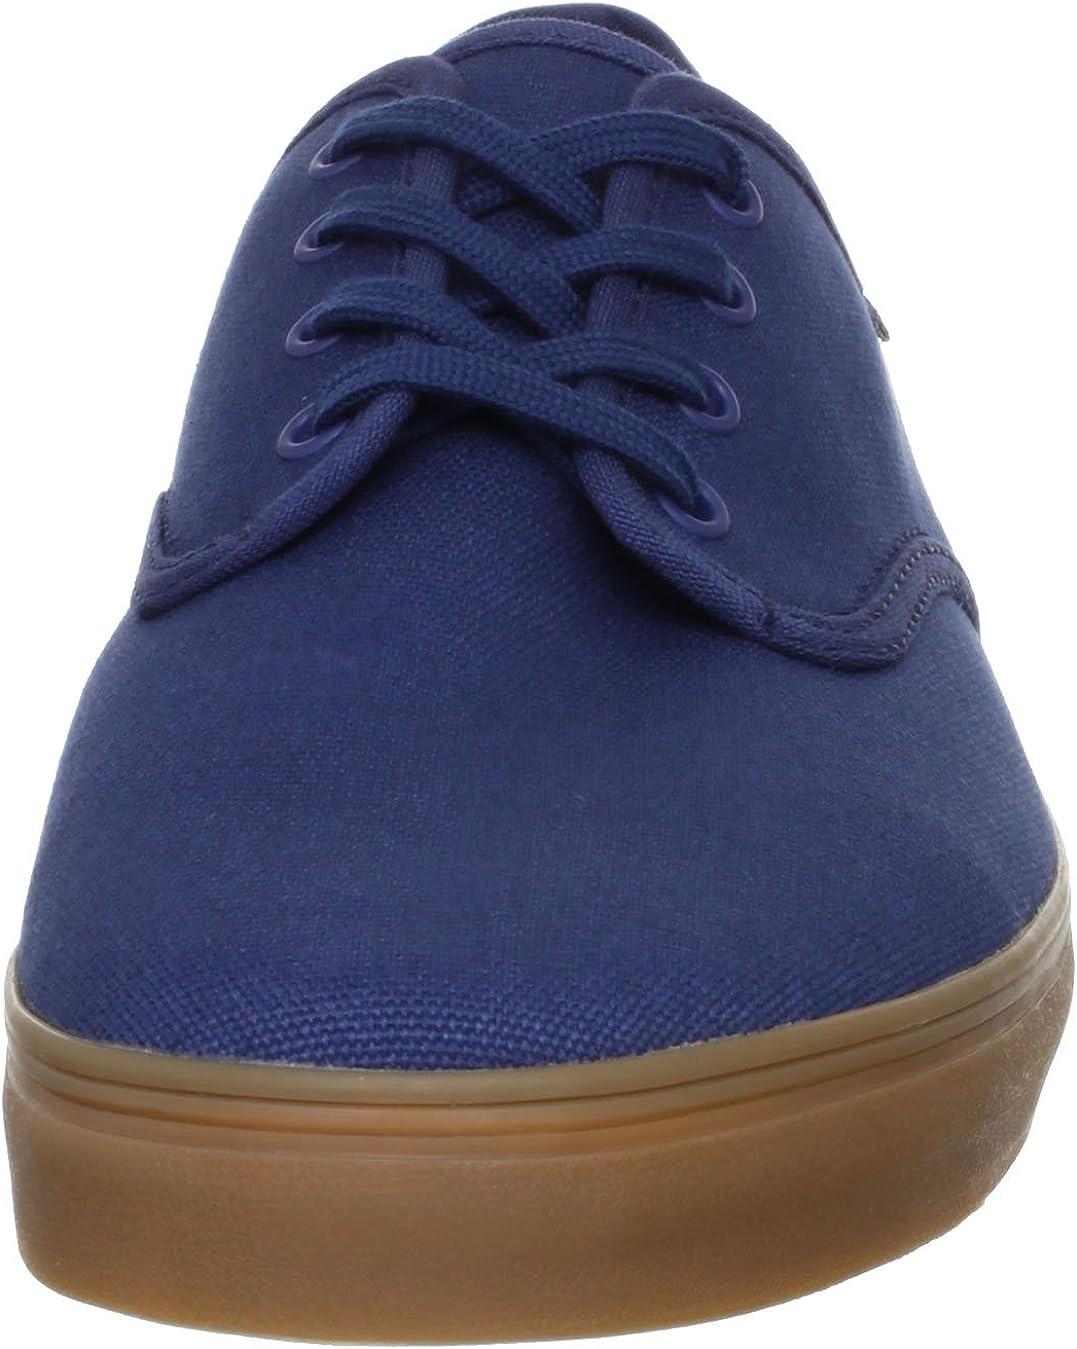 Vans Unisex Shoes Madero Dark Denim Gum Sneakers